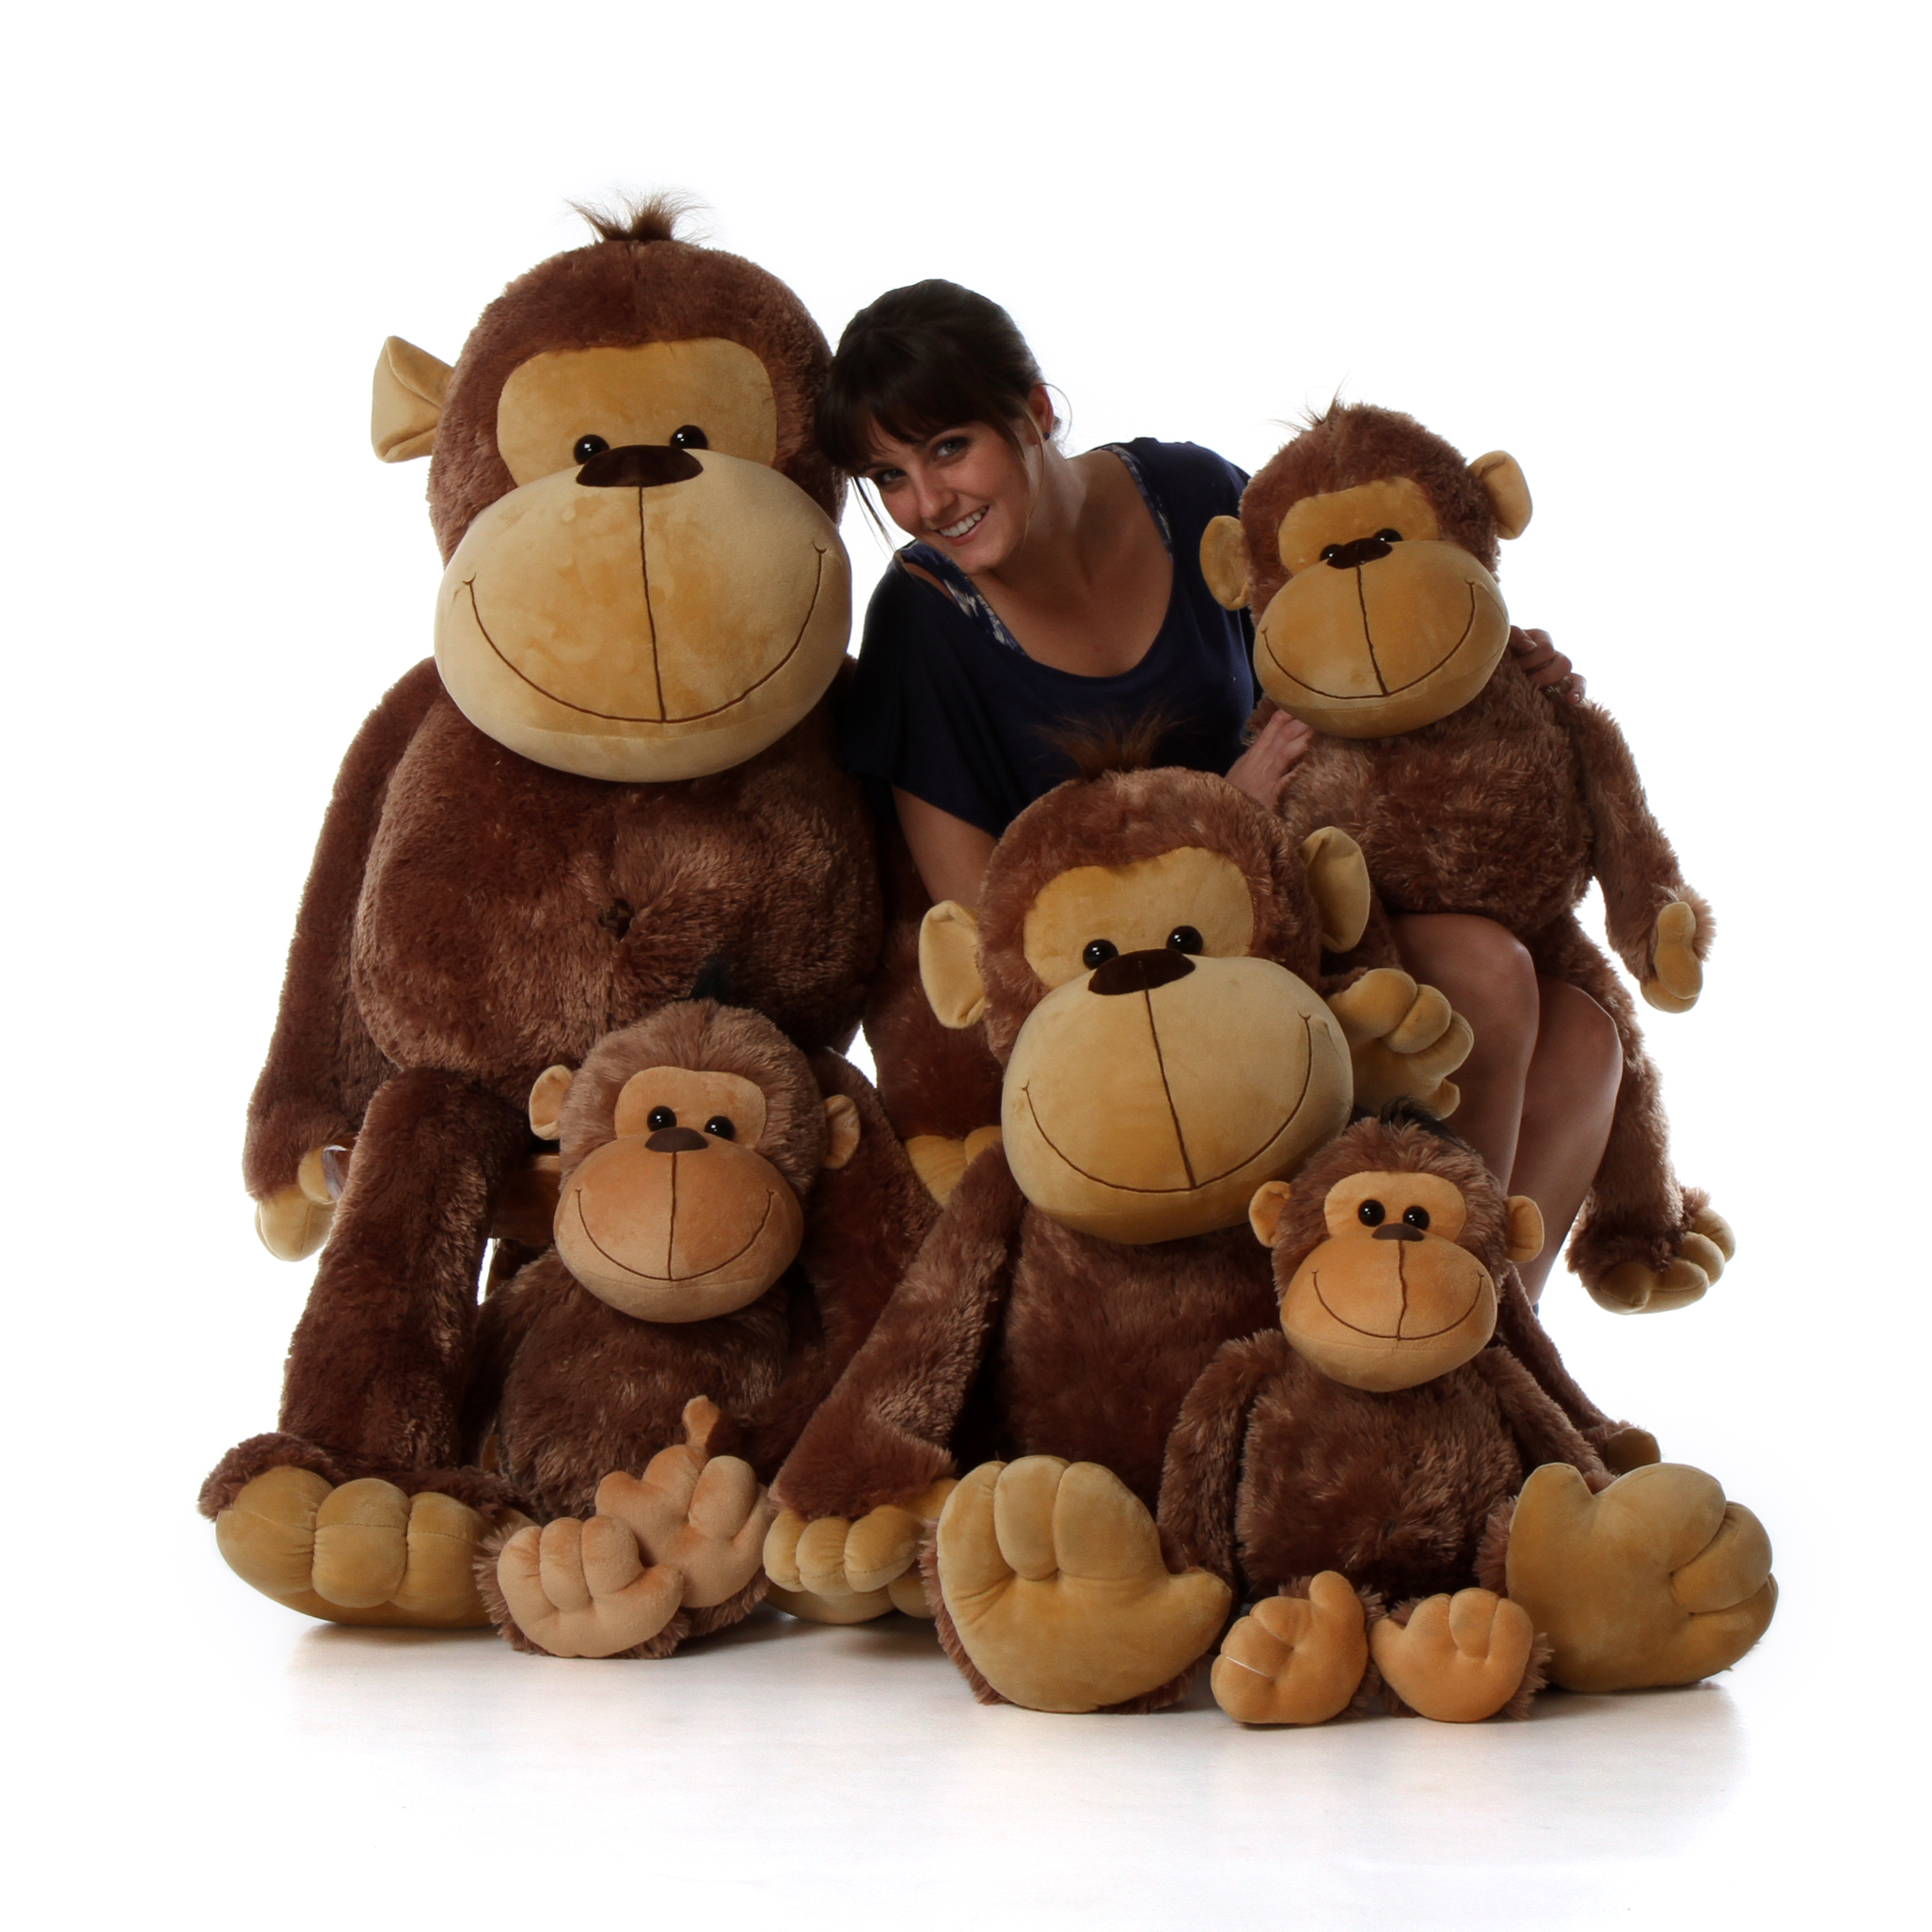 monkey giant teddy